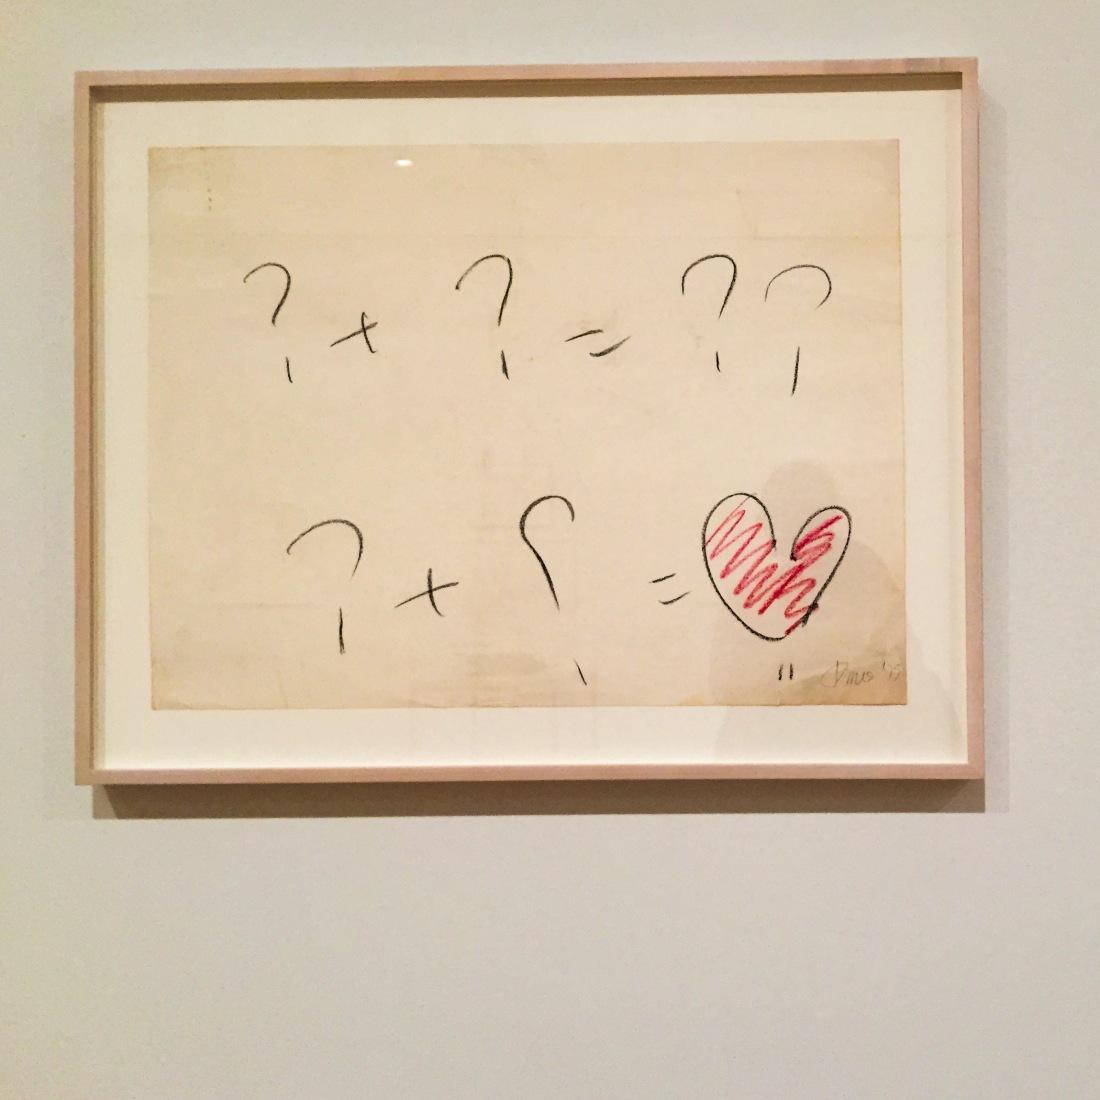 Modern Art - SFMOMA - Nam June Paik.jpeg